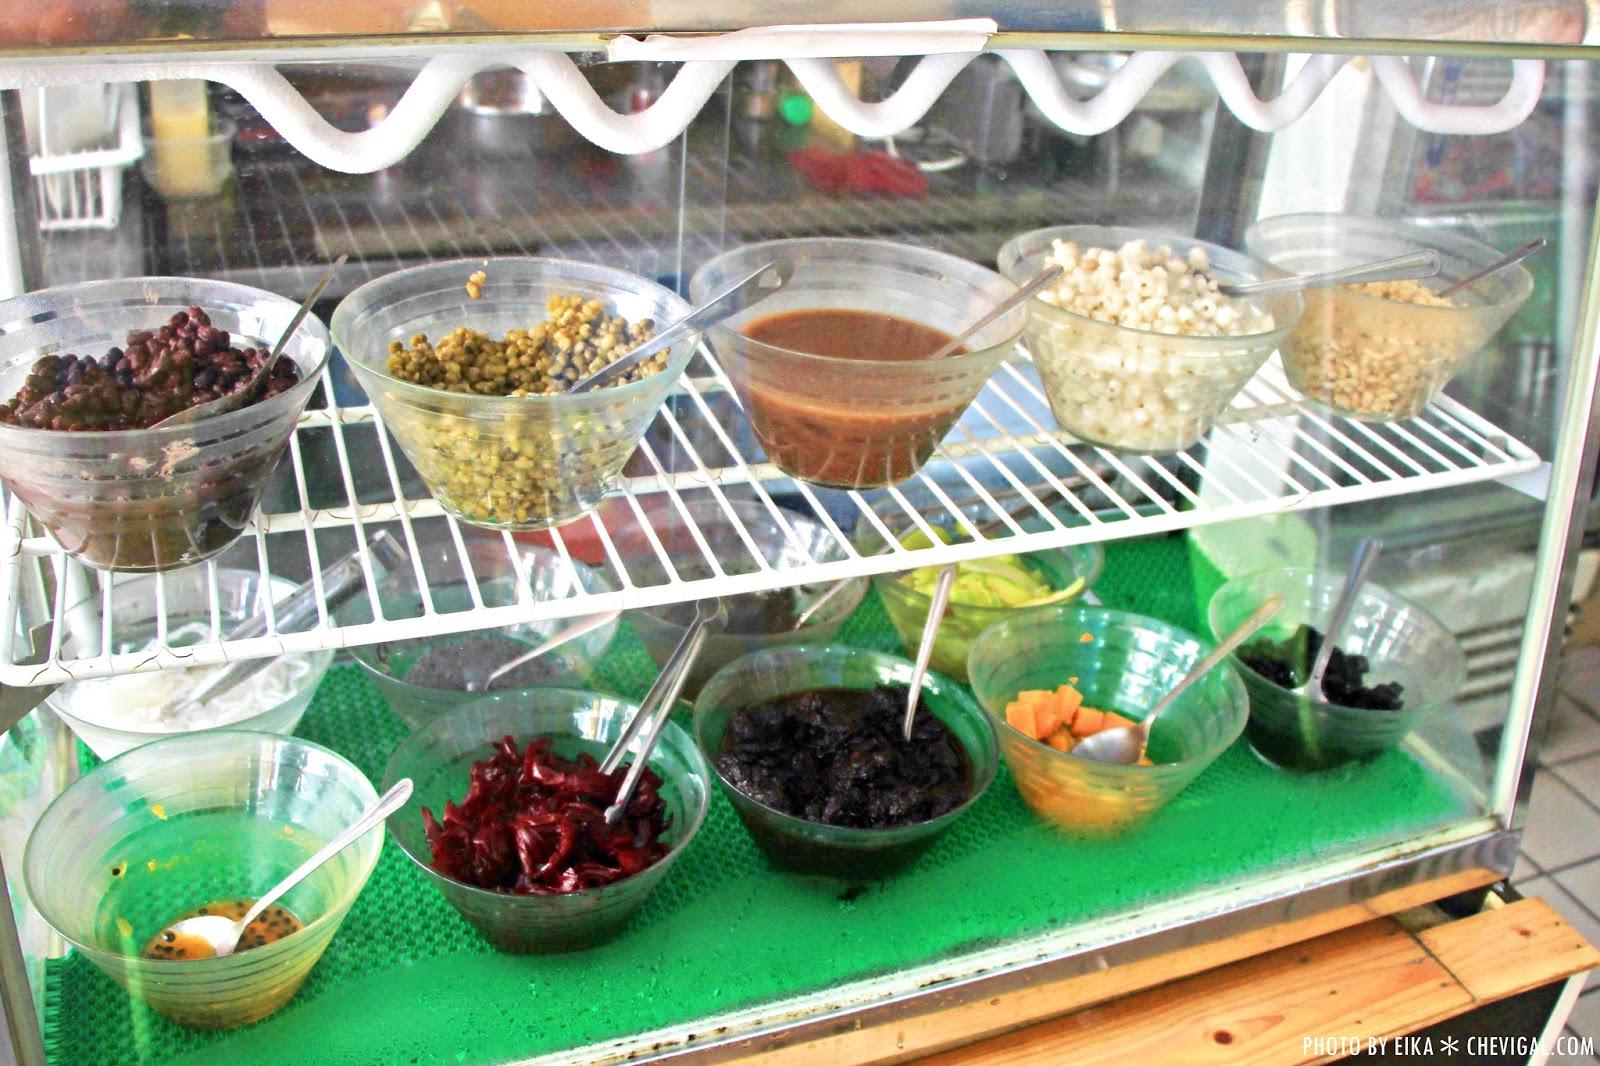 IMG 0122 - 台中烏日│蔡冰甜品。雪山上的愛情最純粹。全台獨有的鳳梨玫瑰冰。等你來感受芬芳原味